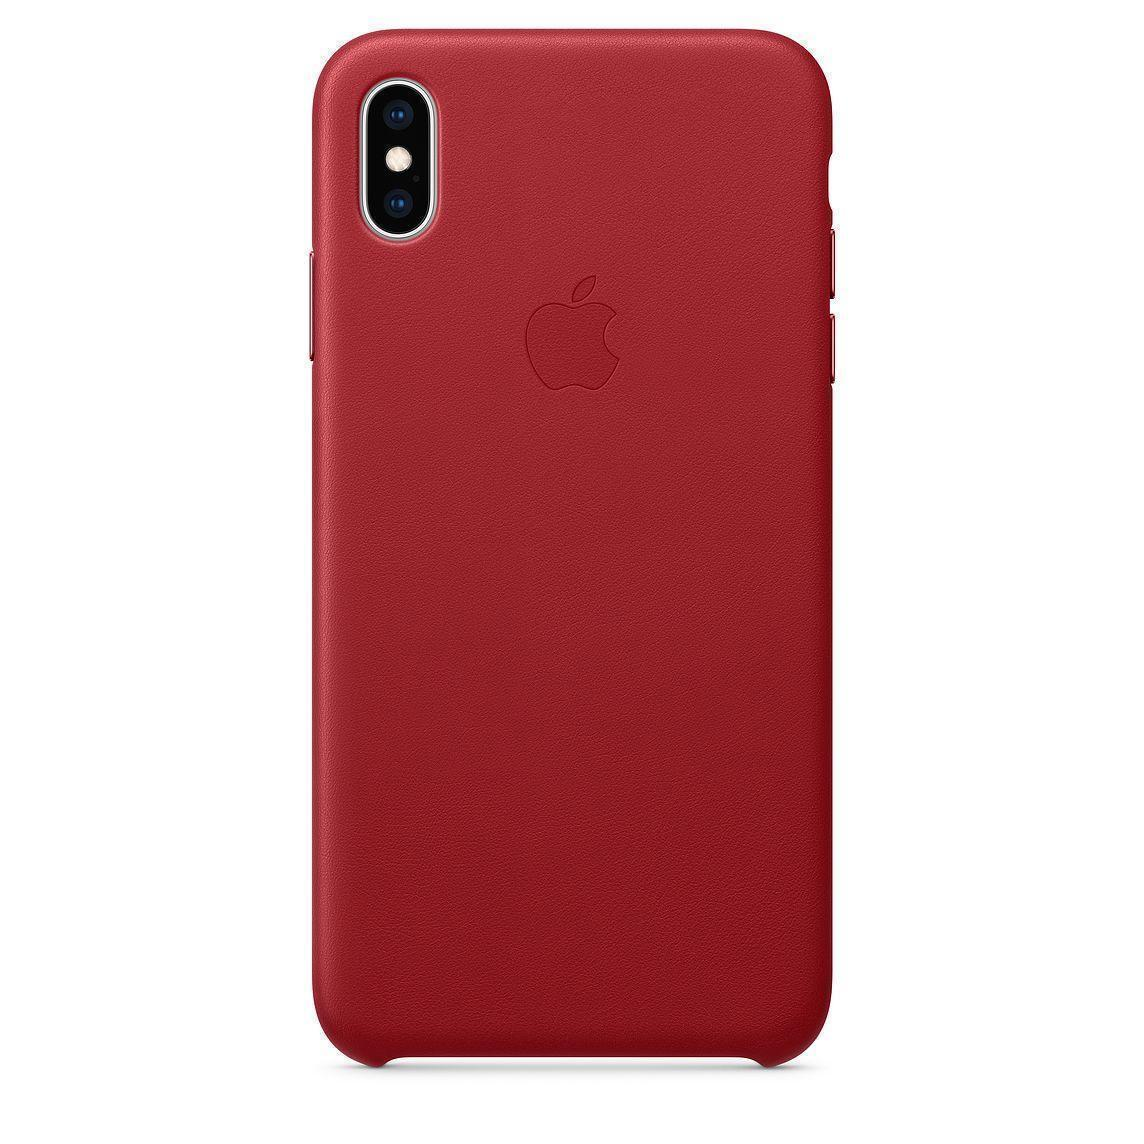 Купить Чехол-накладка Apple Leather Case для iPhone XS Max Red (MRWQ2ZM/A)